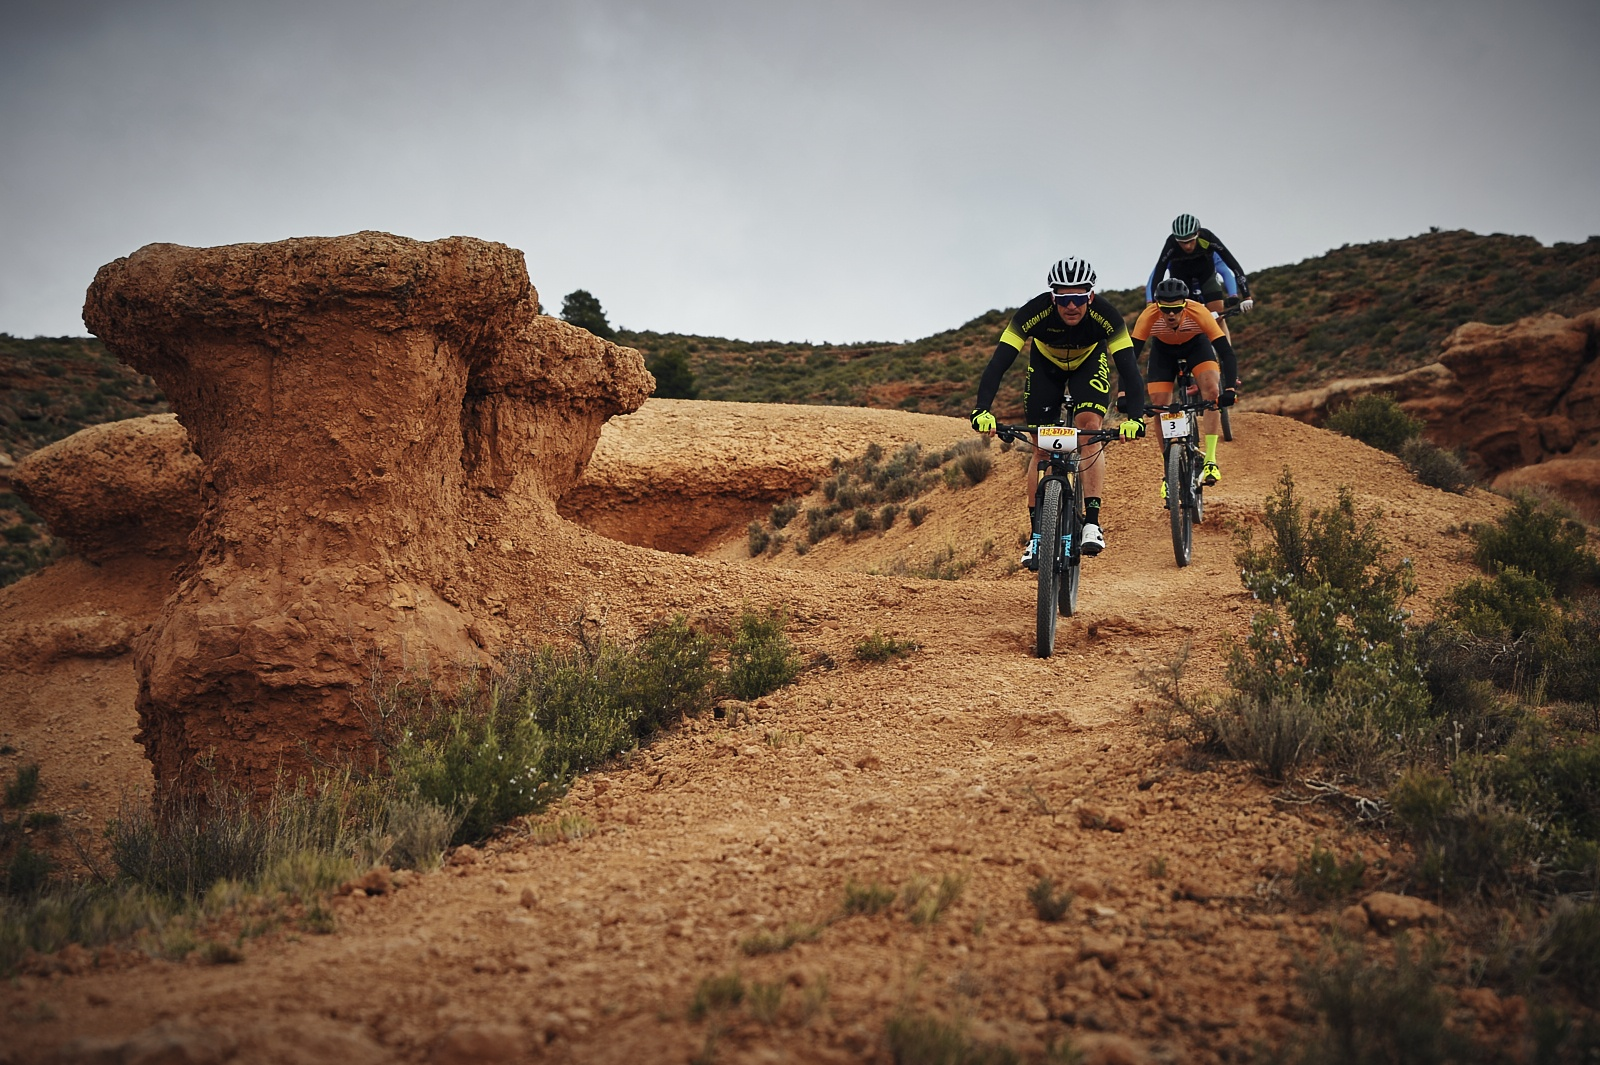 Aragon Bike Race Calatayud 2020 - QuieroMisFotos.com - Sergio Tomico, Photography